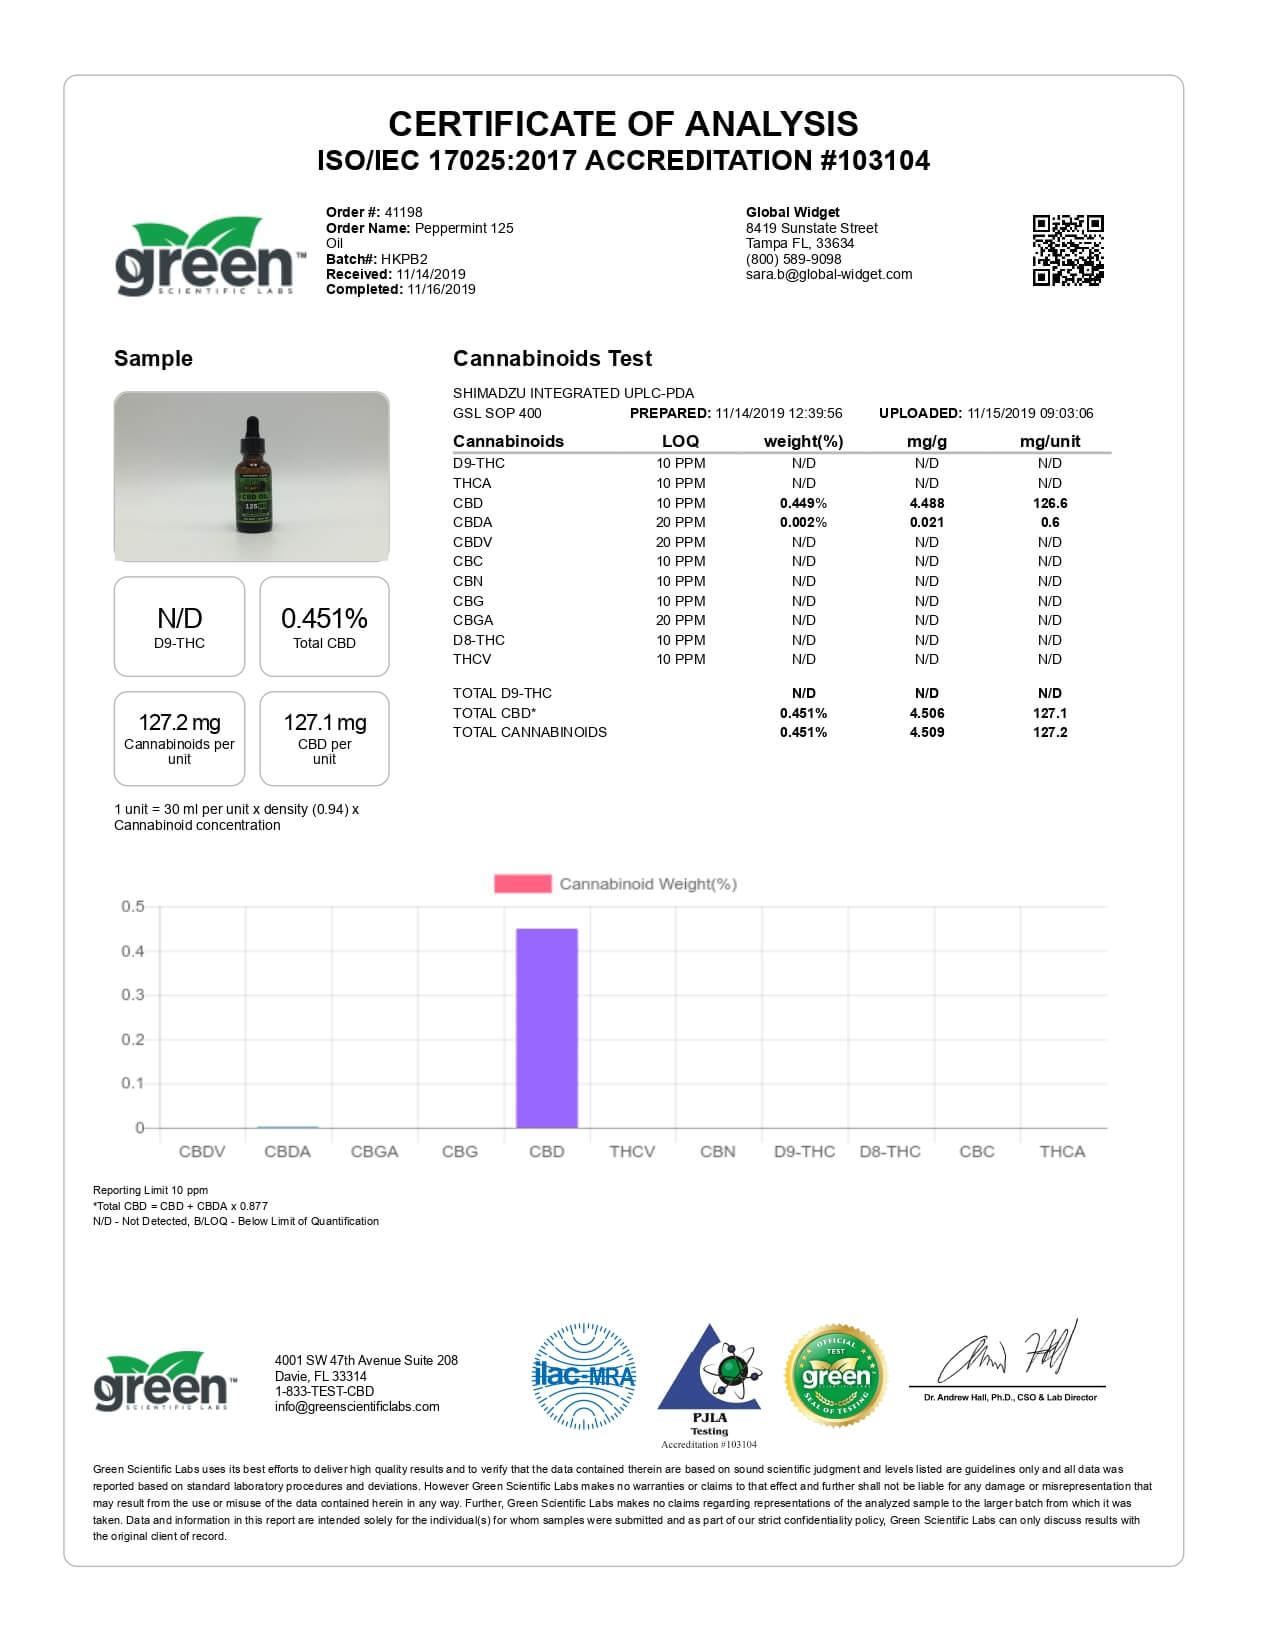 Hemp Bombs CBD Tincture Peppermint 125mg Lab Report